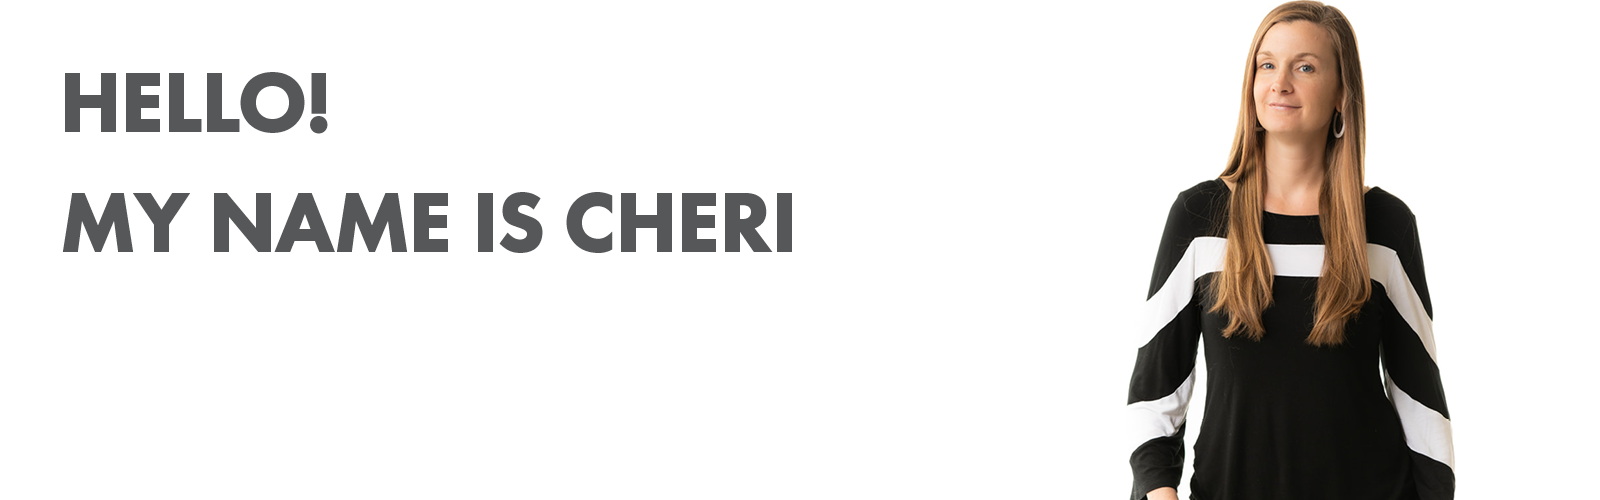 cheri | design inspiration | fbc remodel